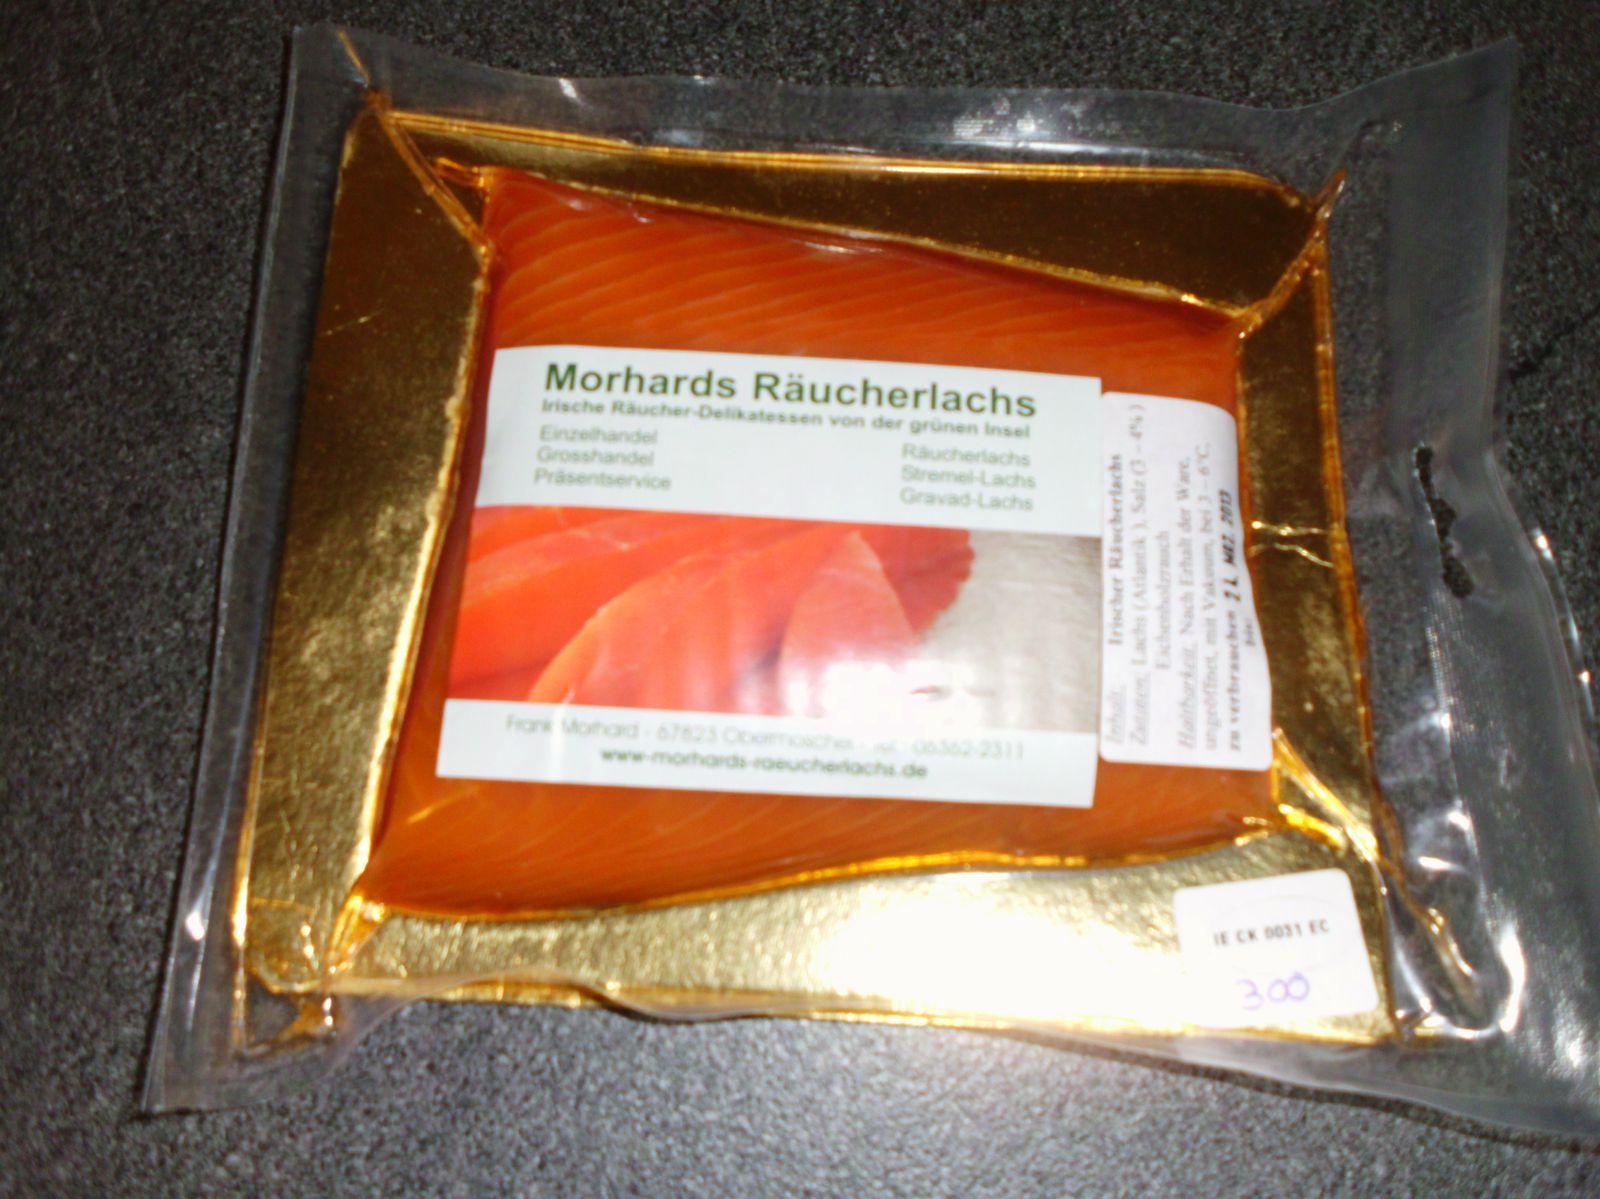 Morhards Räucherlachs